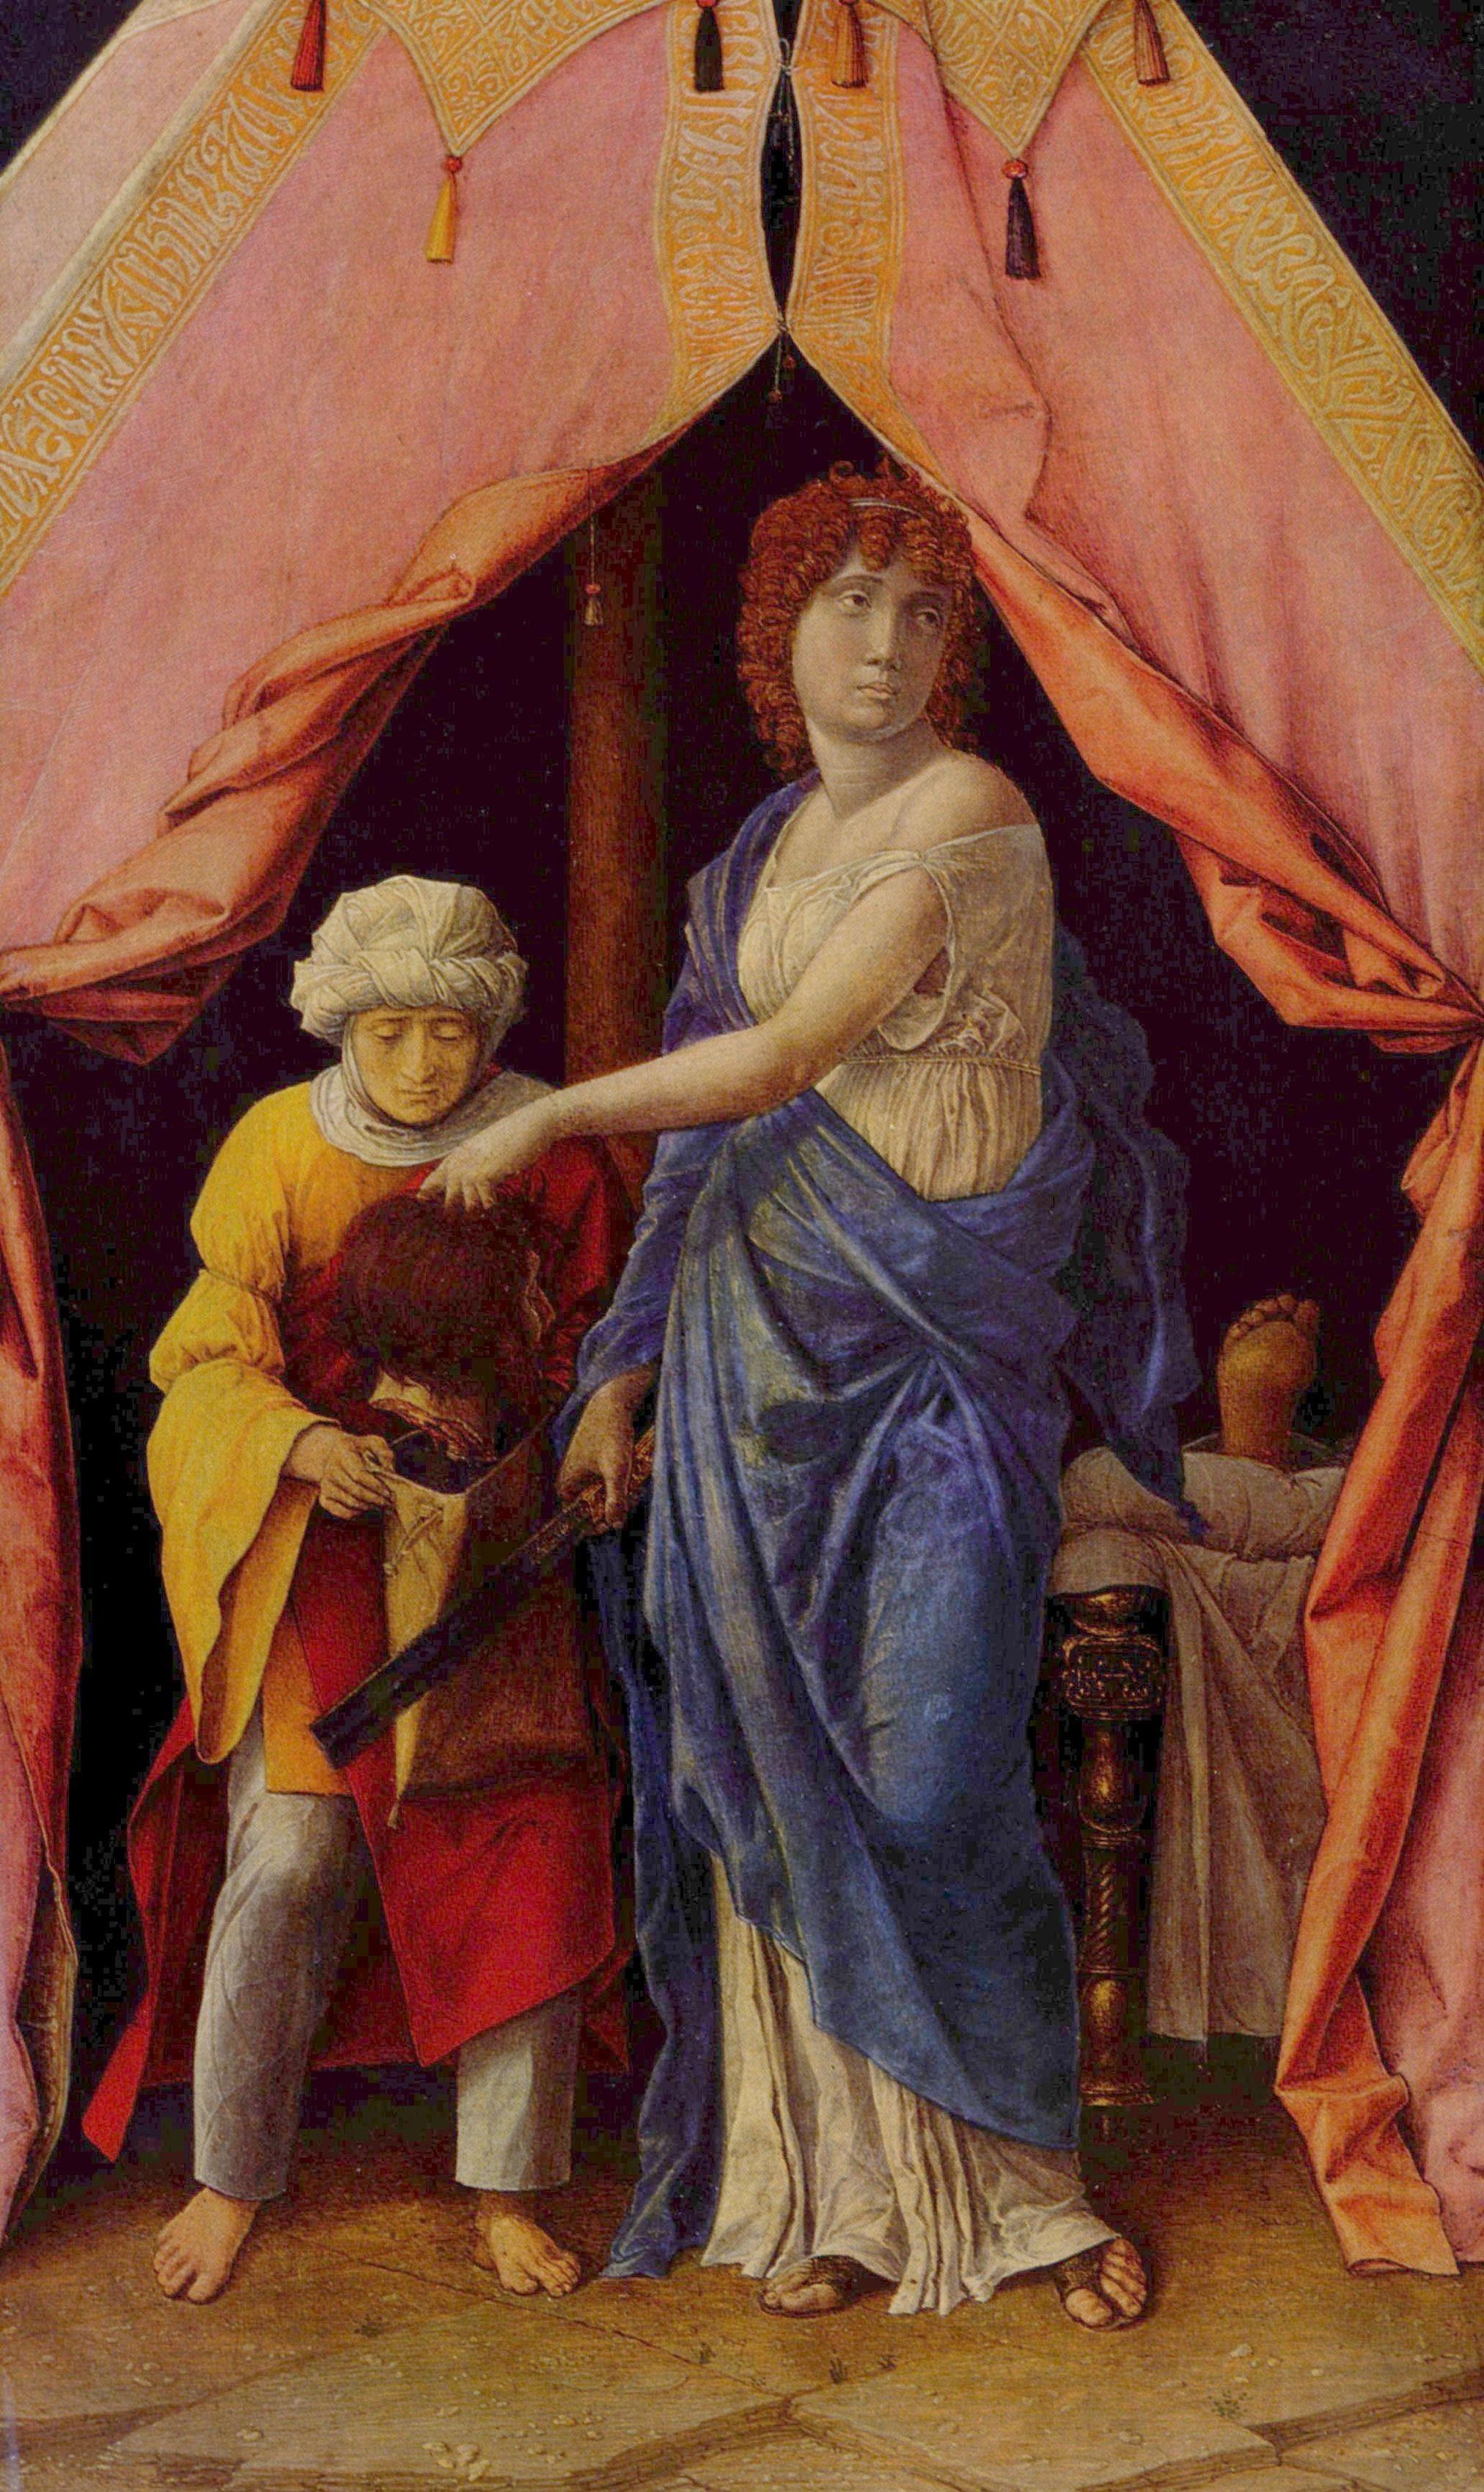 Großbild: Andrea Mantegna: Judith und Holofernes